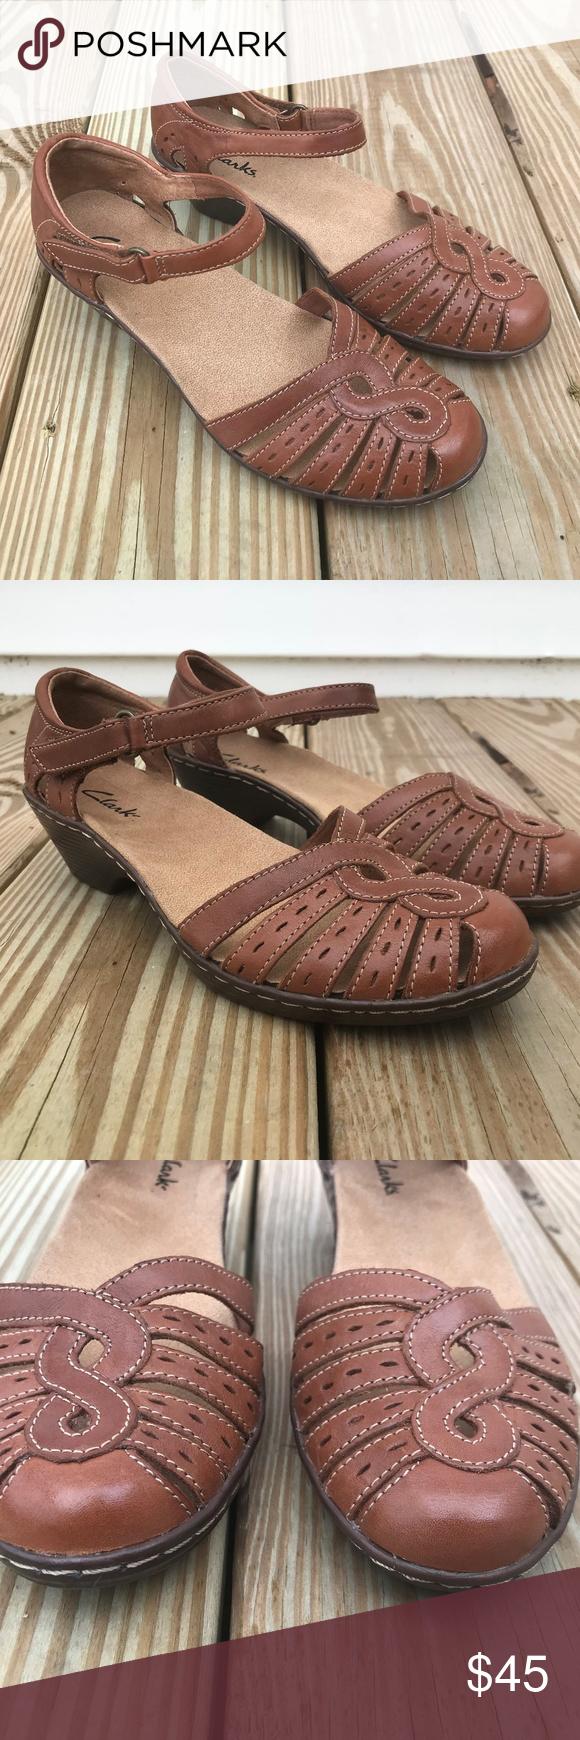 836c83d4e86b Clark Women Shoe Wendy River Sandal Shoe Tan Clark Women Shoe Wendy River  Sandal Shoe Tan